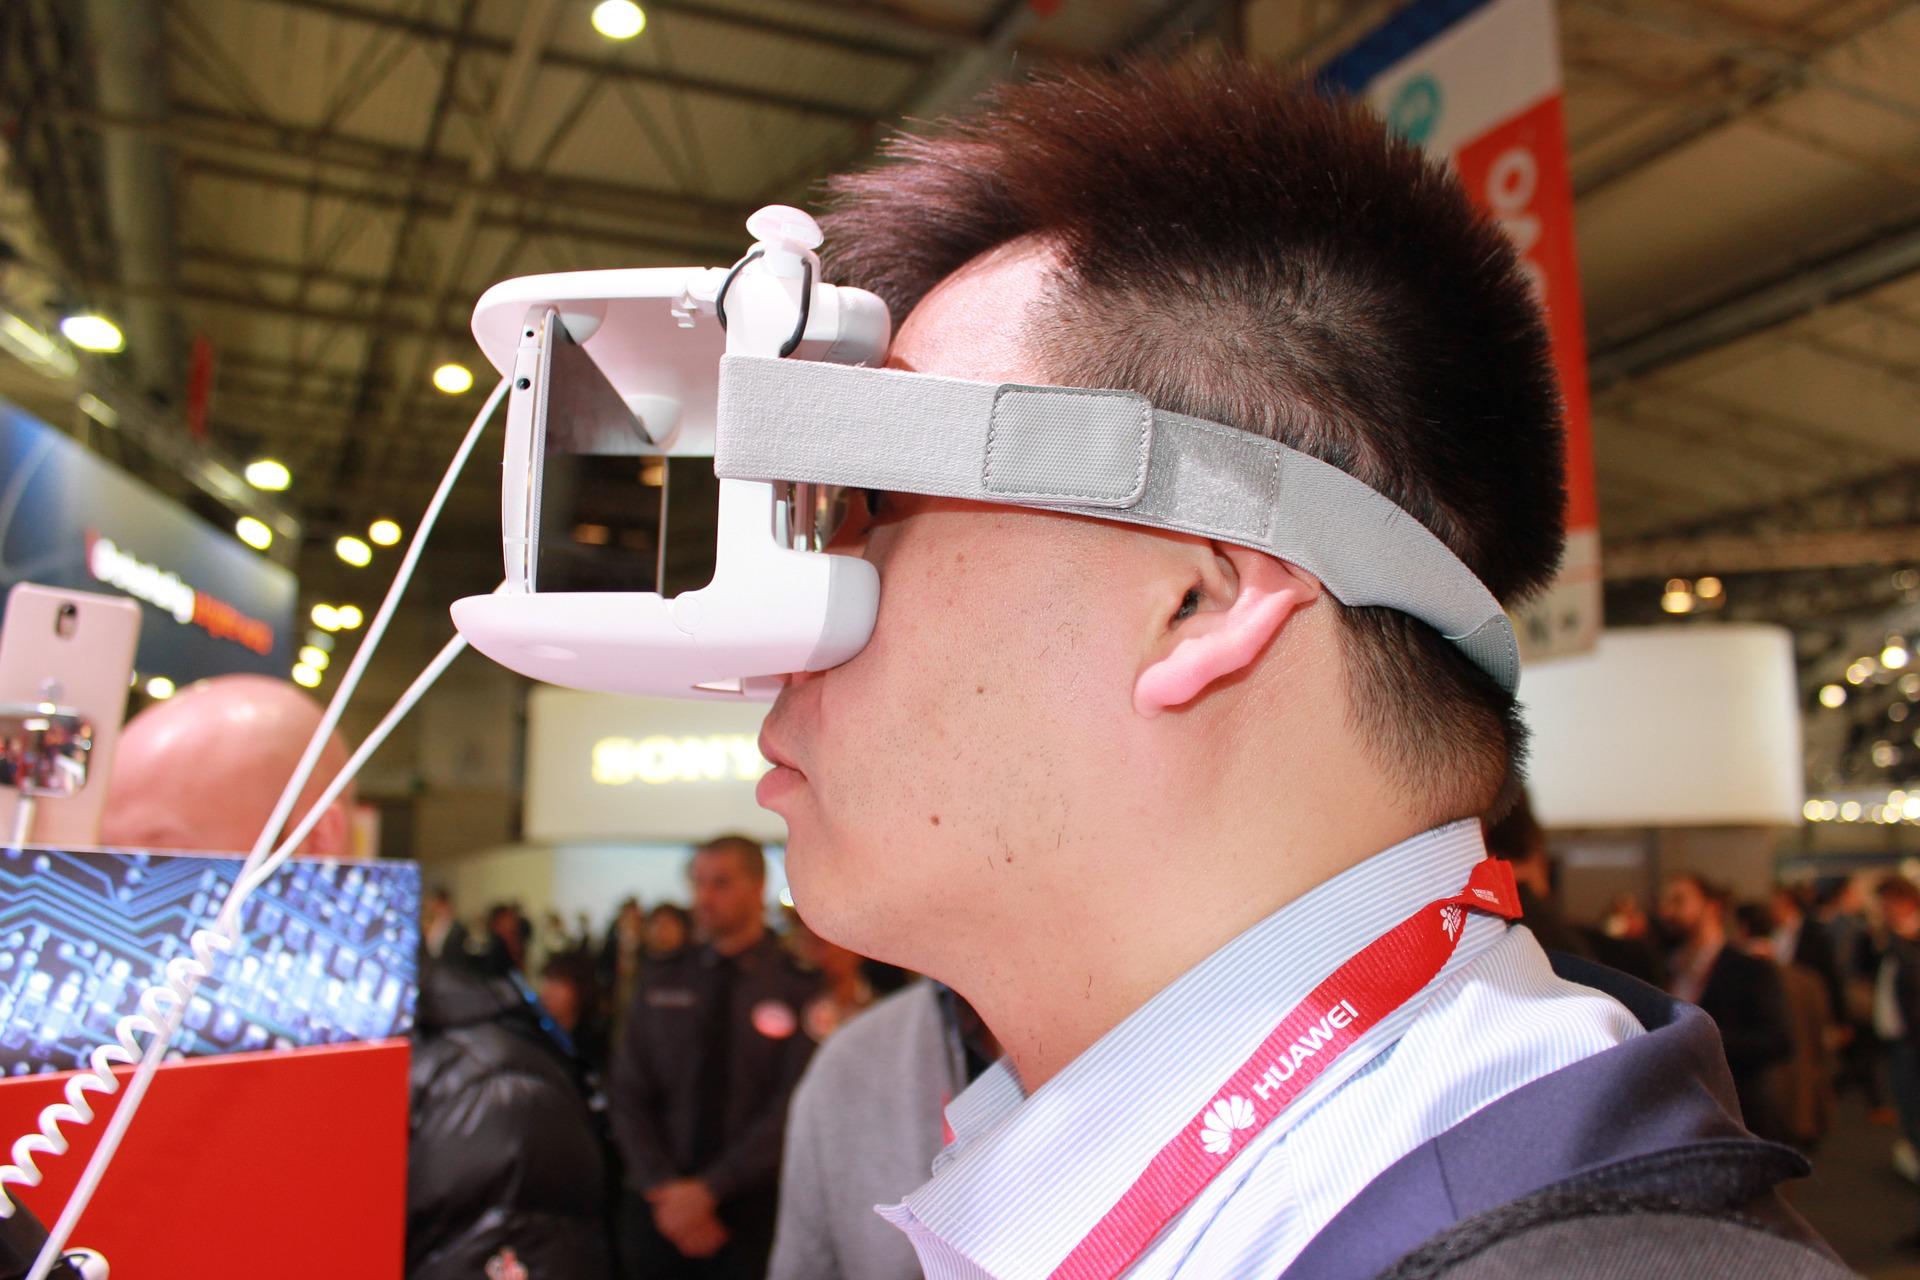 virtual-reality-1237523_1920.jpg